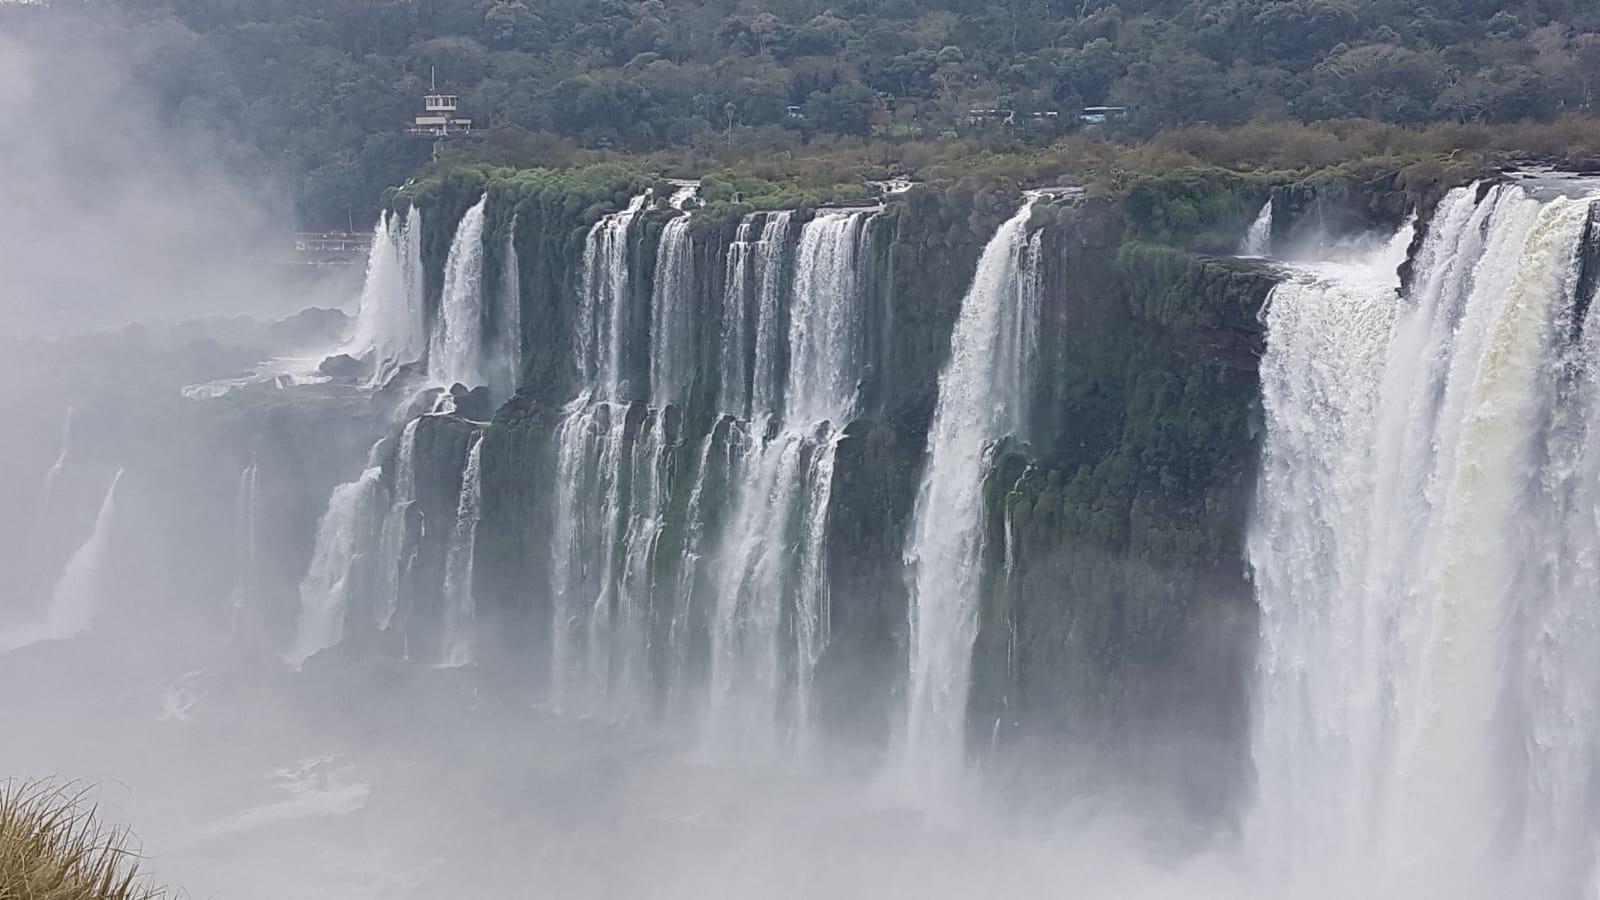 The Majestic, Astounding And Jaw Dropping Iguazu Falls